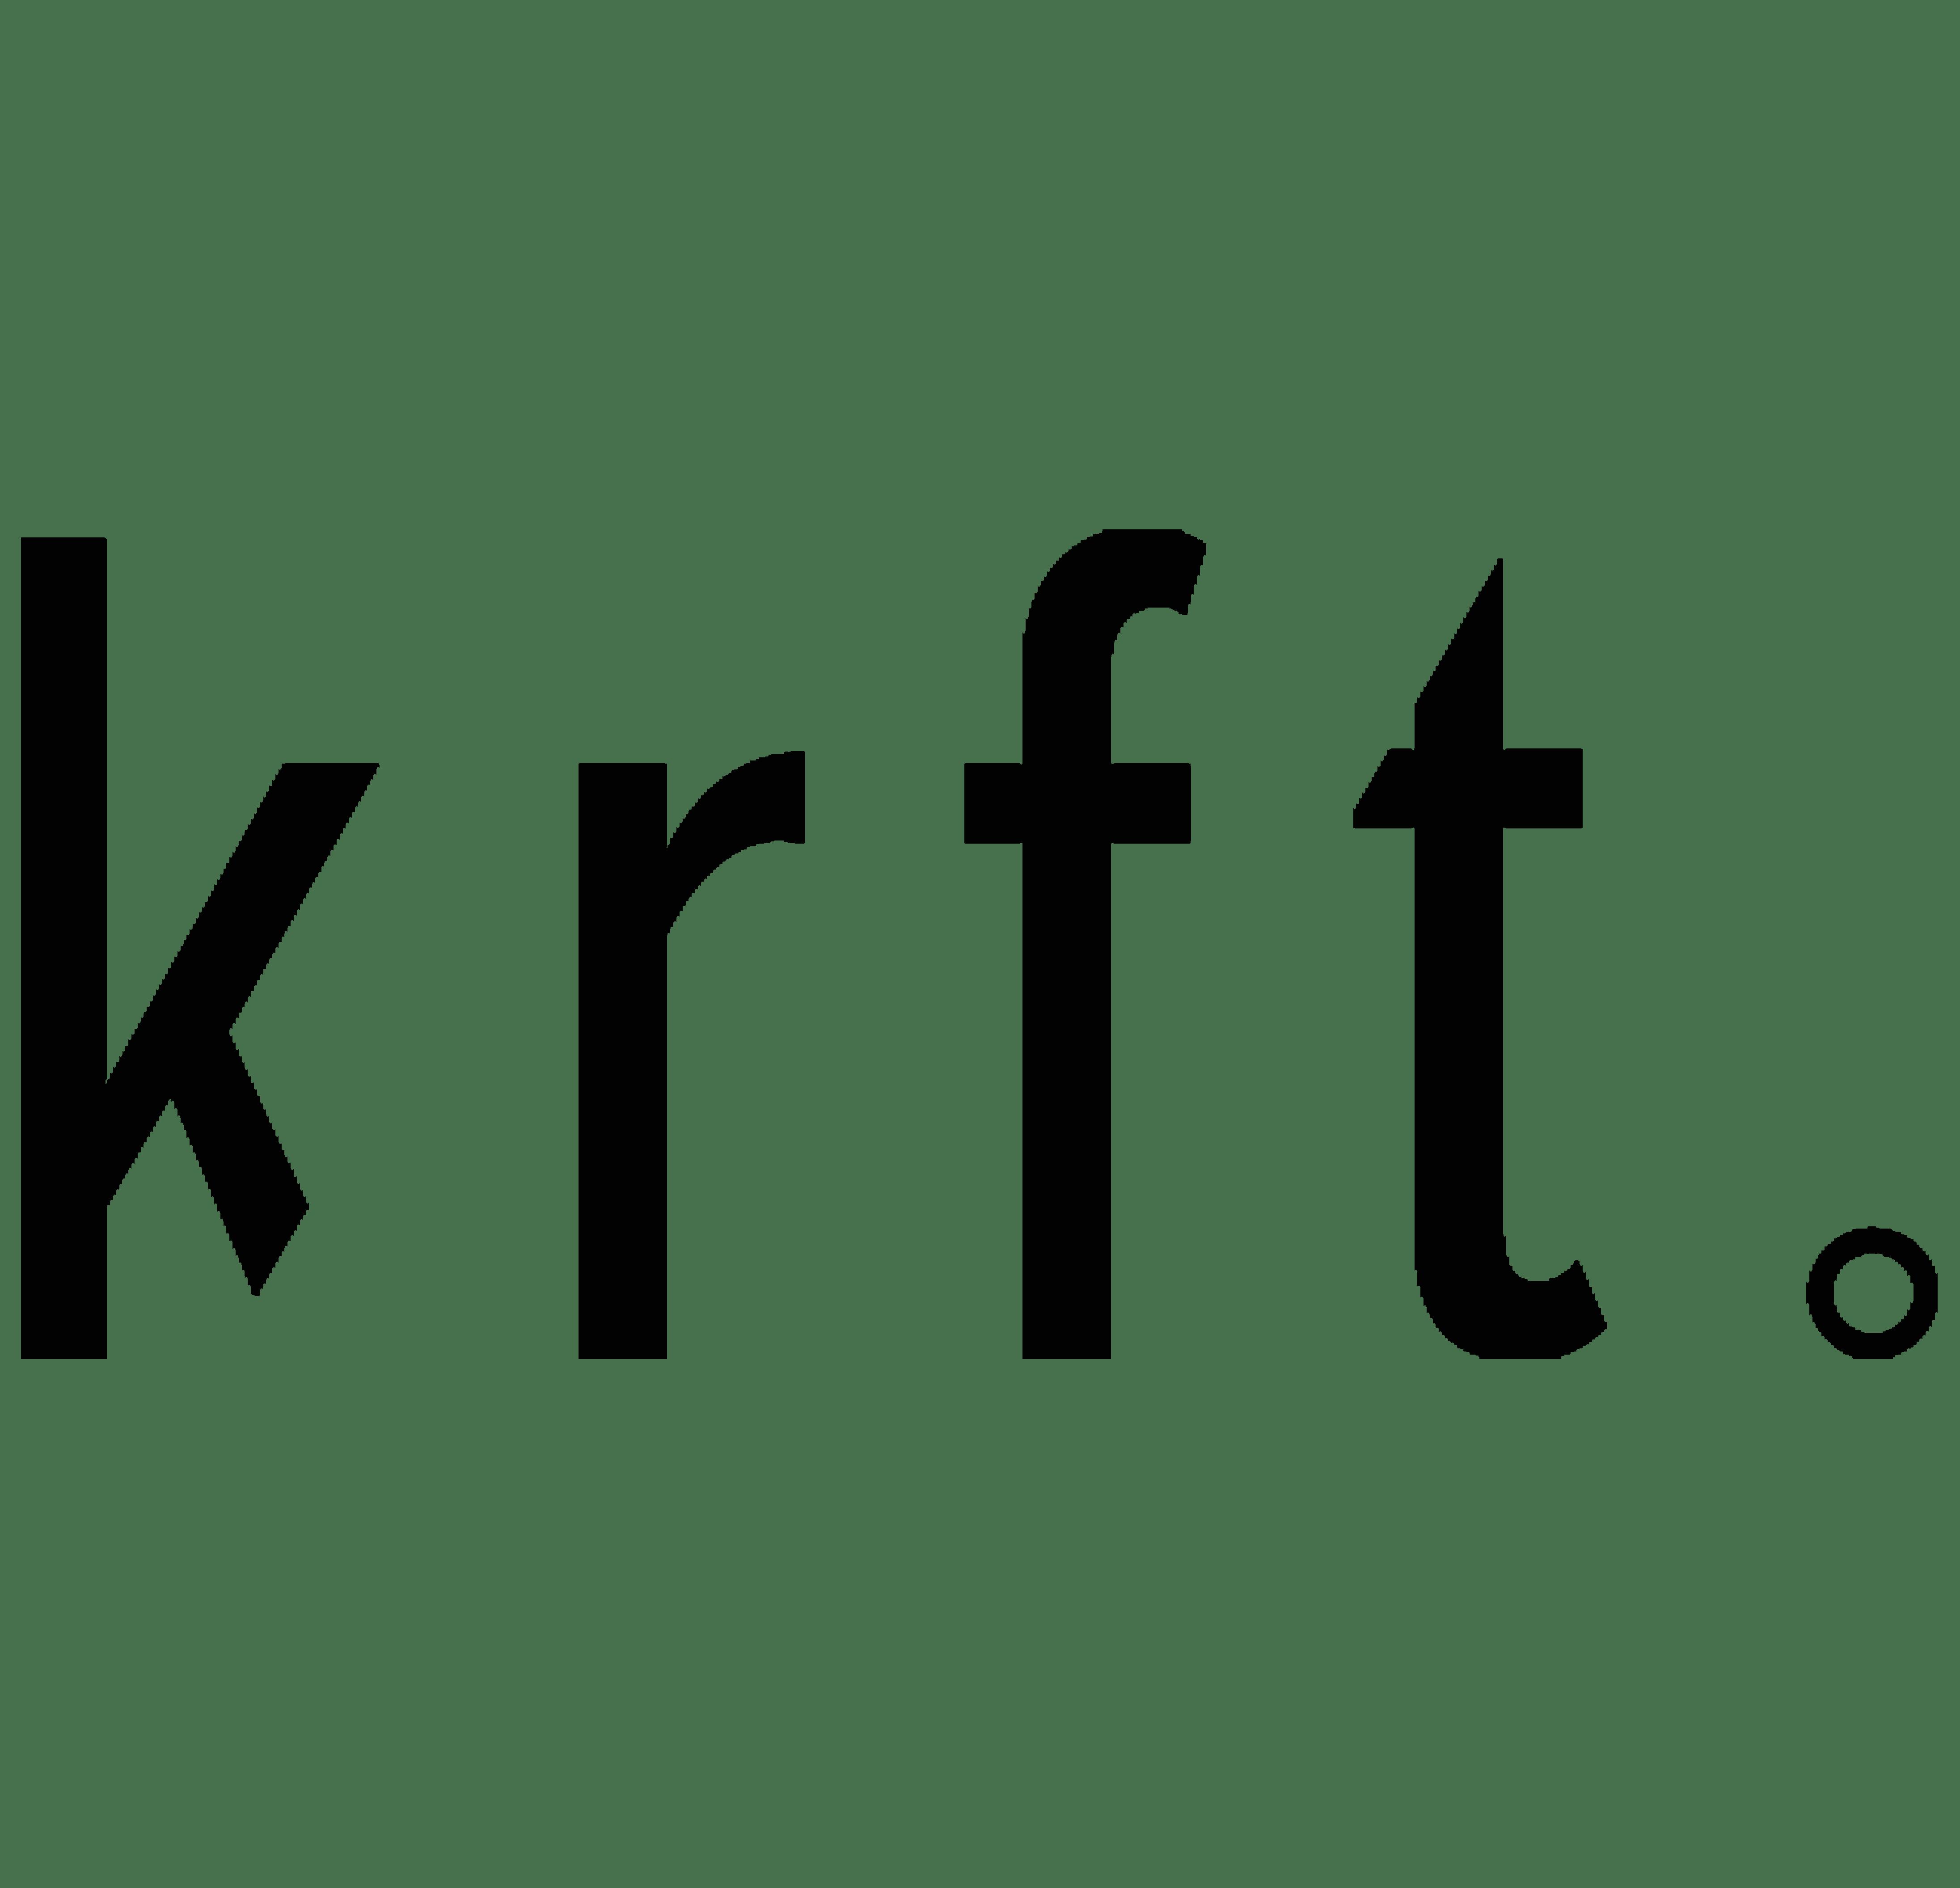 logo-krft-blk